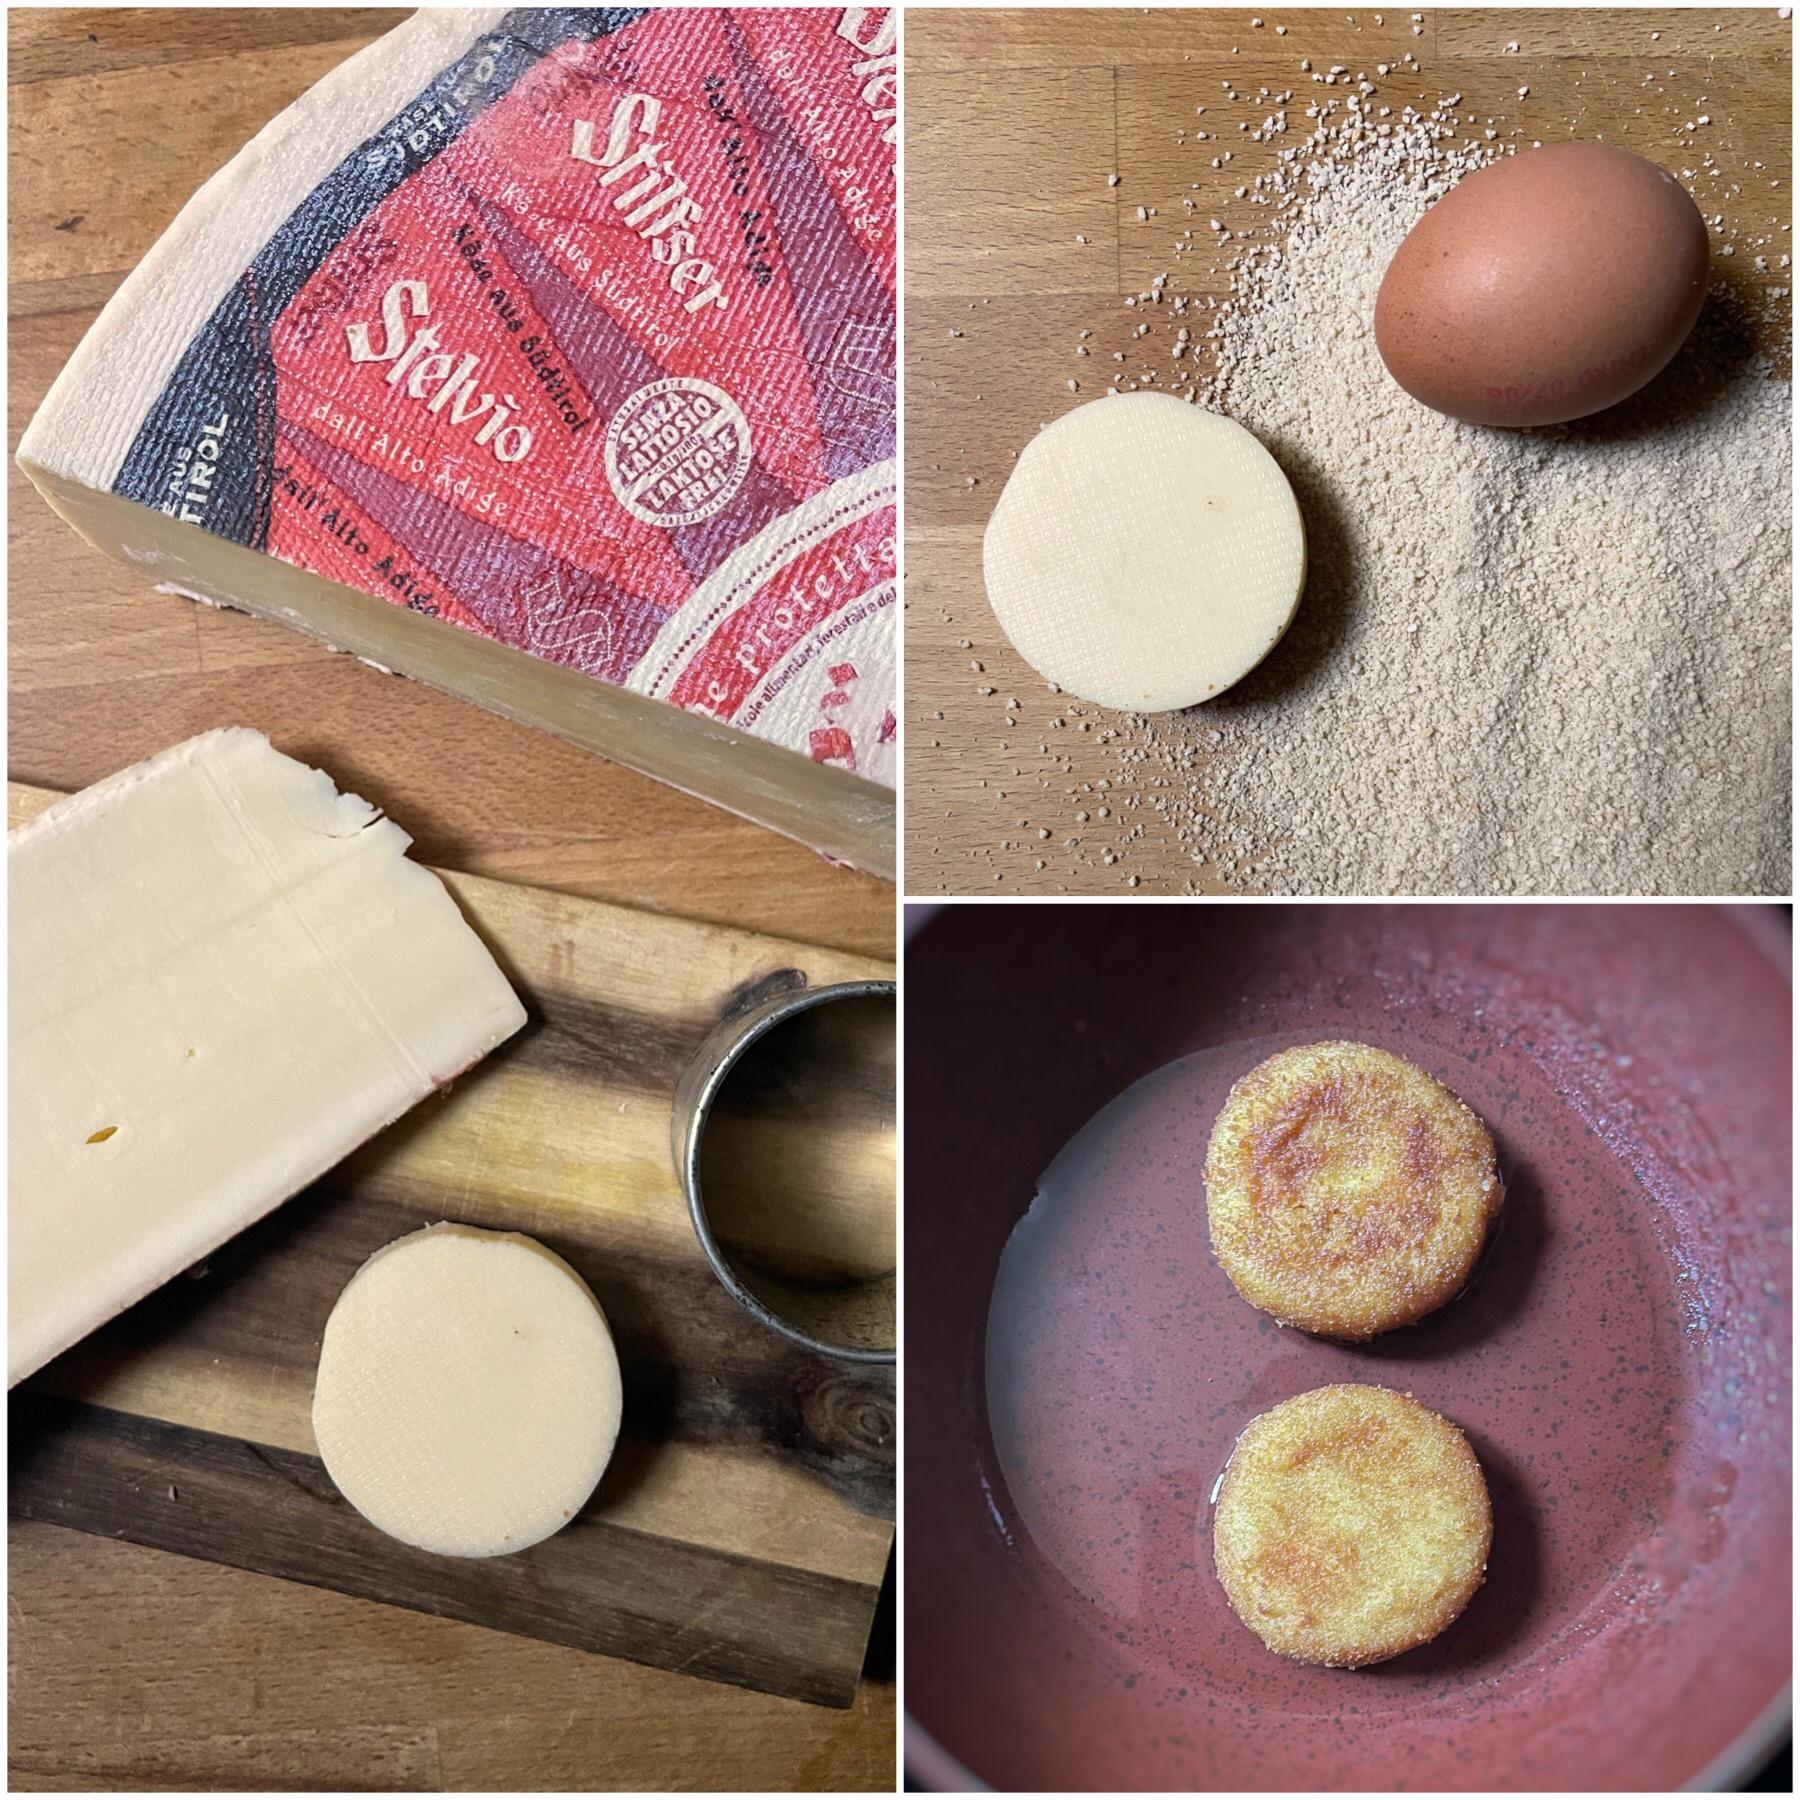 Pepite di formaggio Stelvio DOP